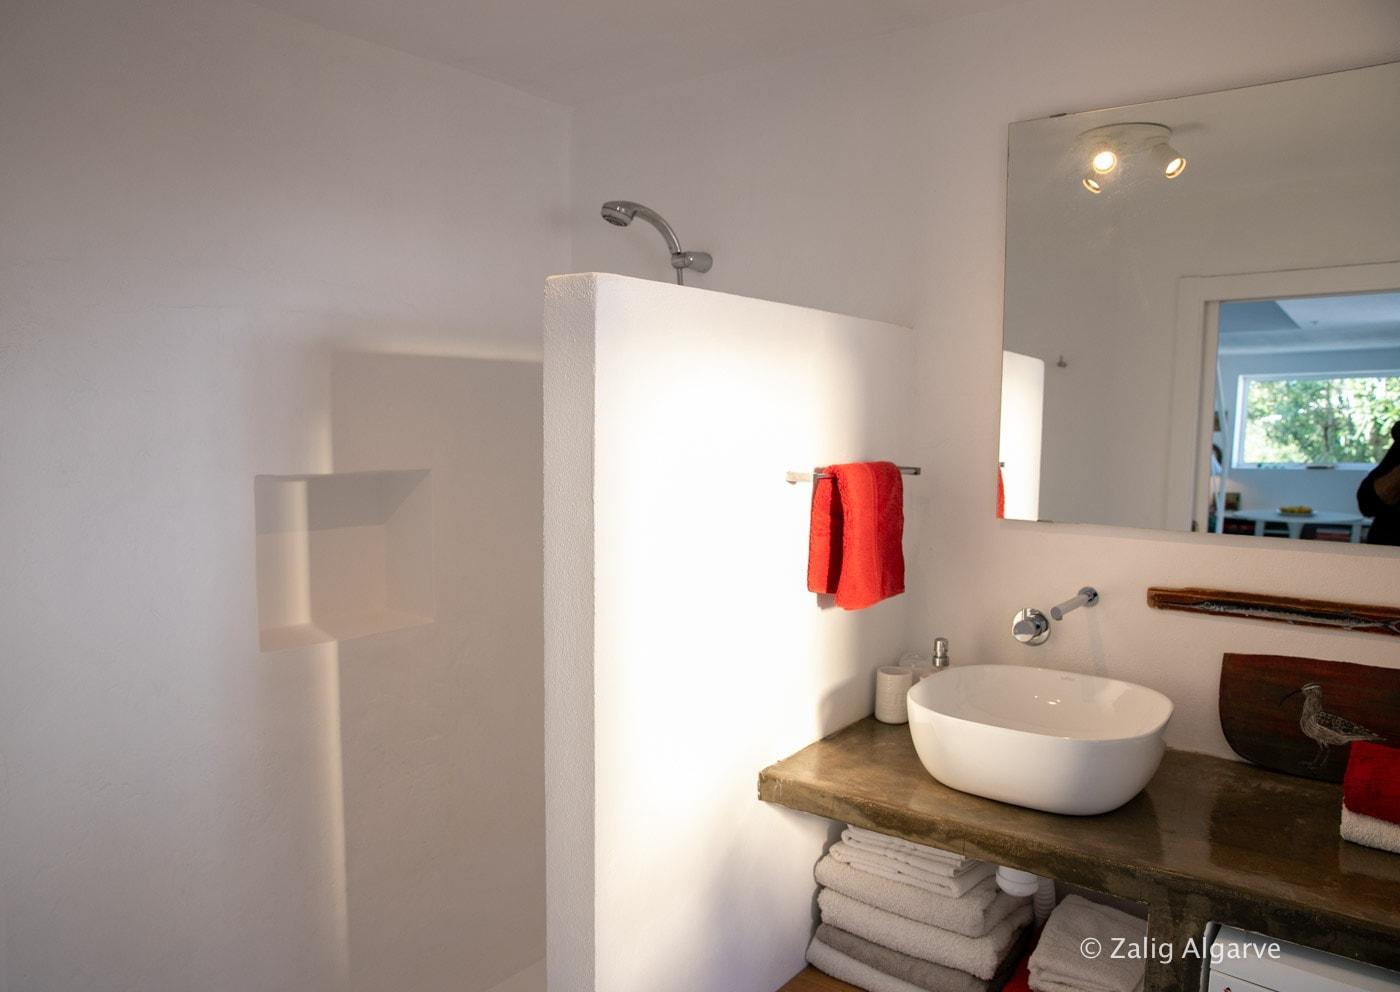 Casa-Alfarrobeira-Zalig-Algarve-32